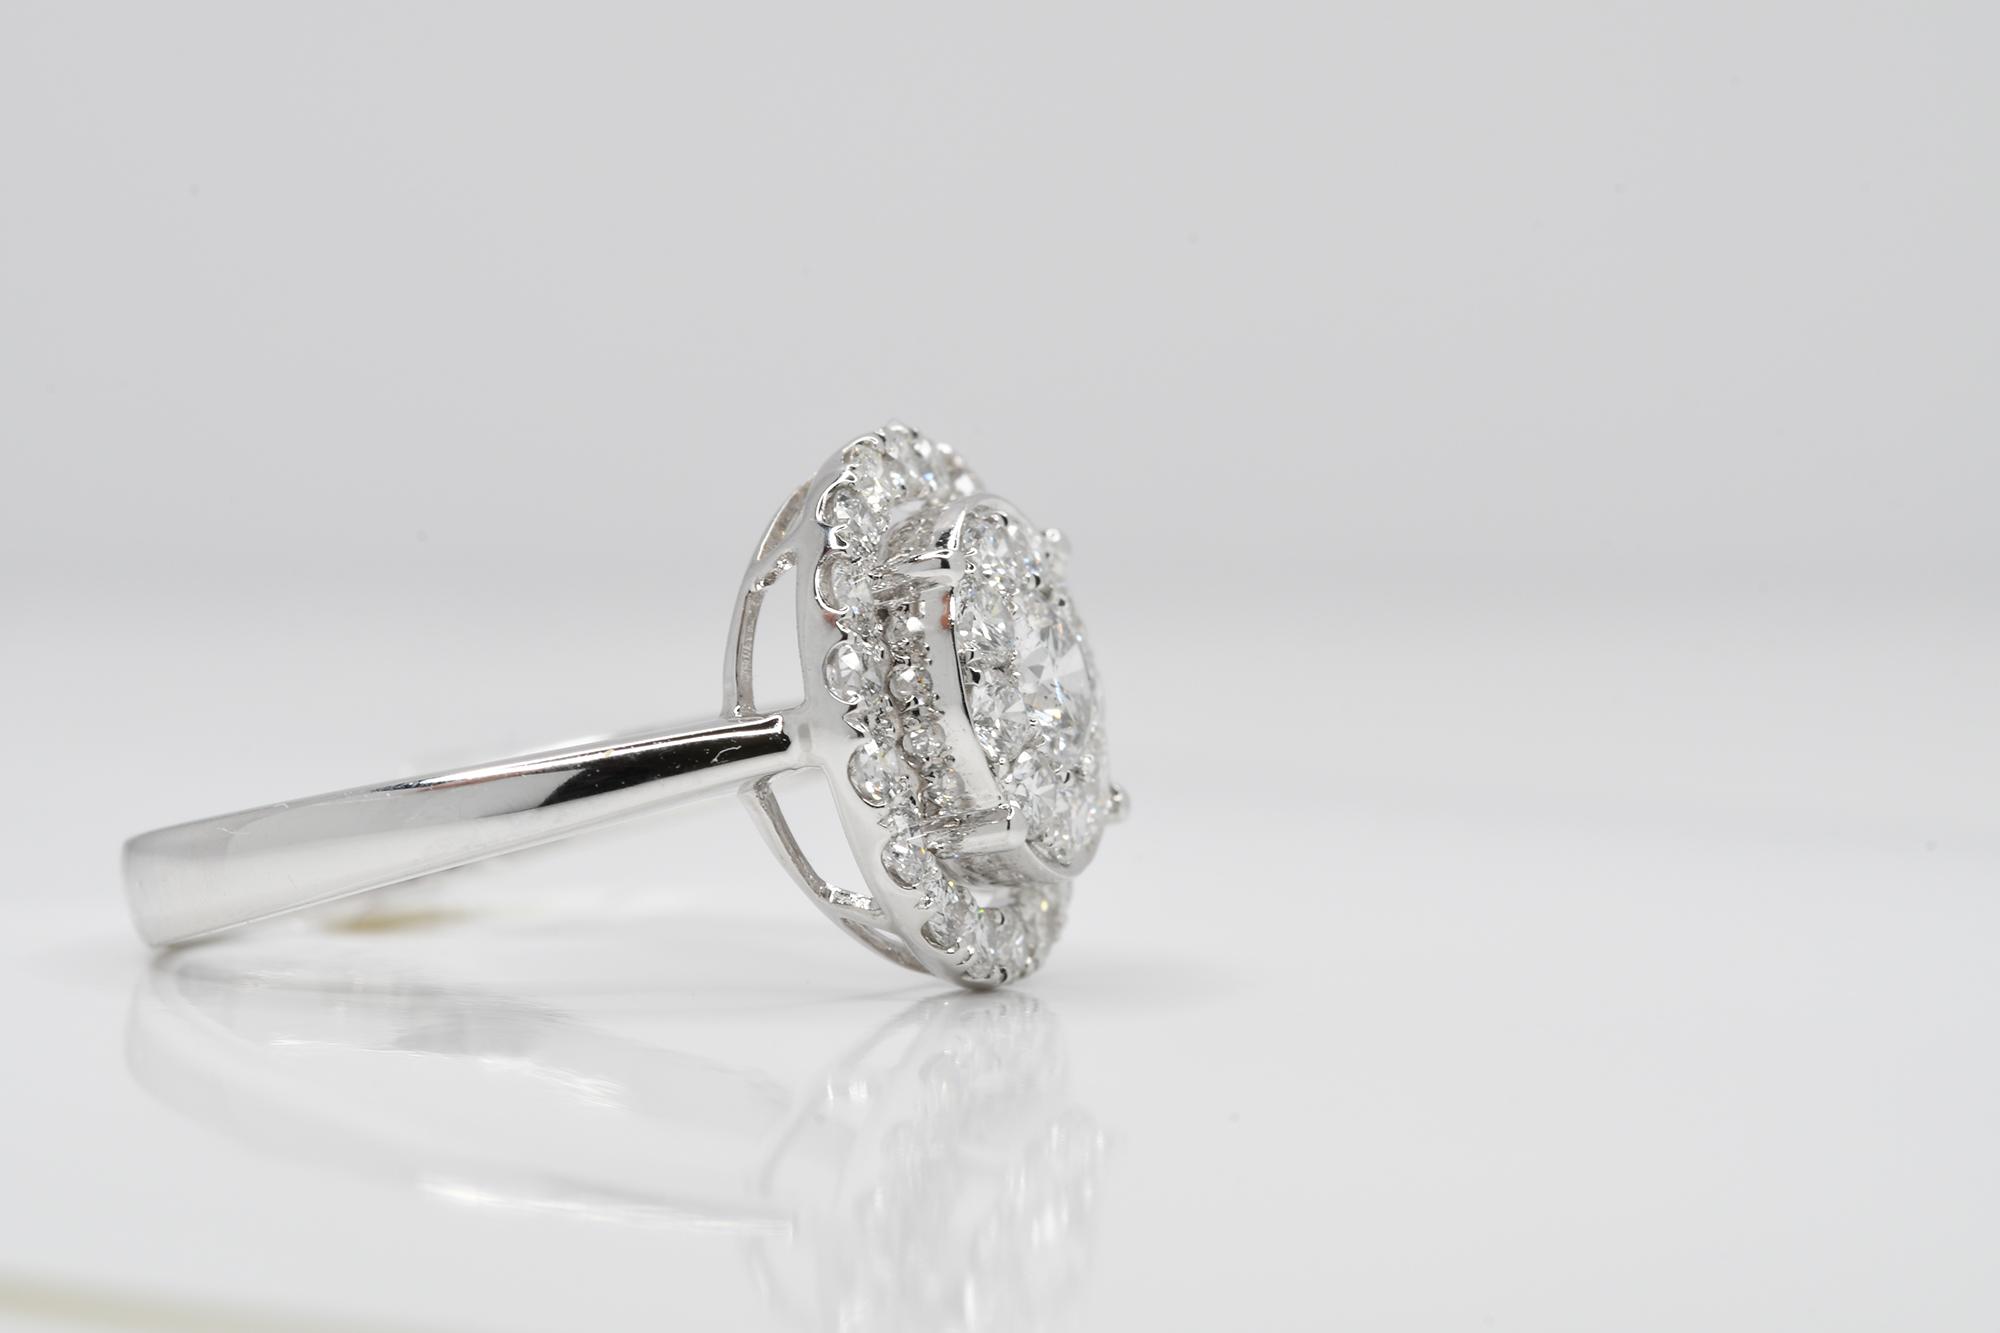 Diamond Ring - Image 2 of 5